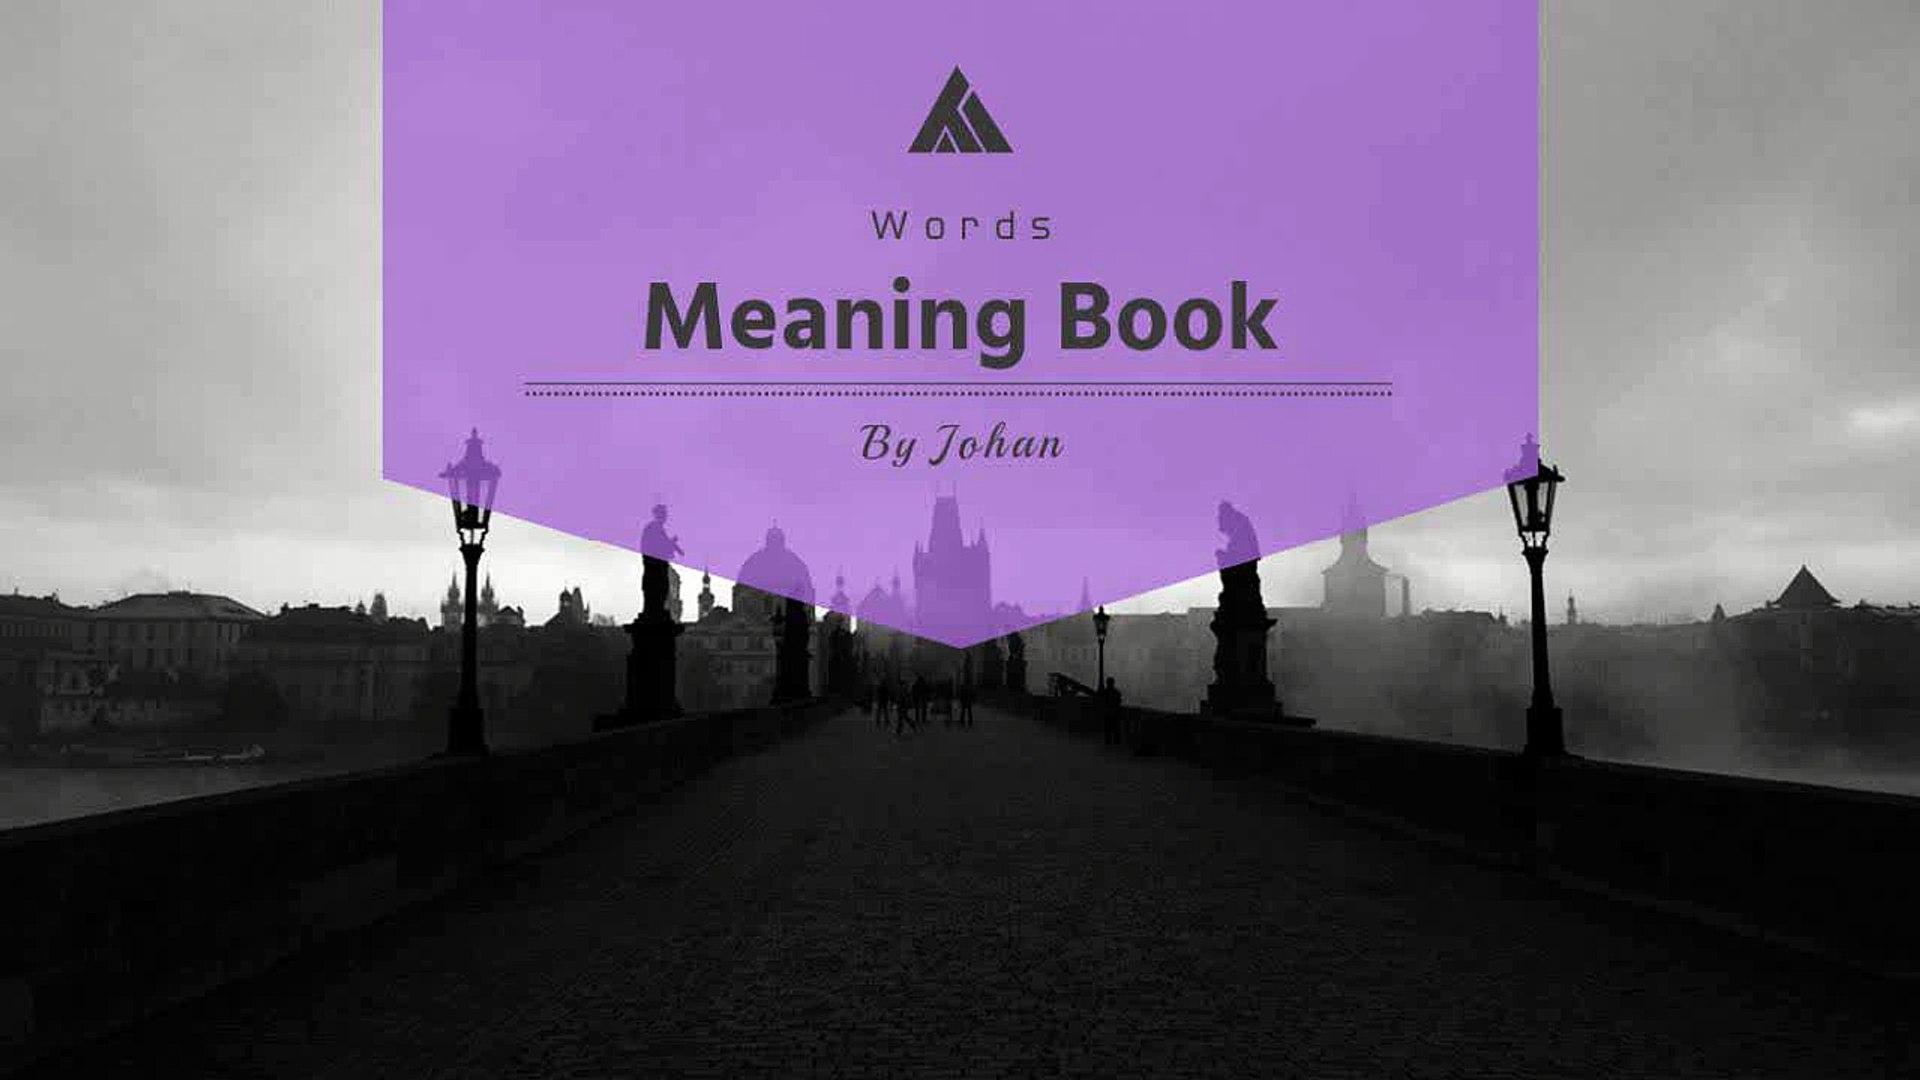 Herbert Meaning